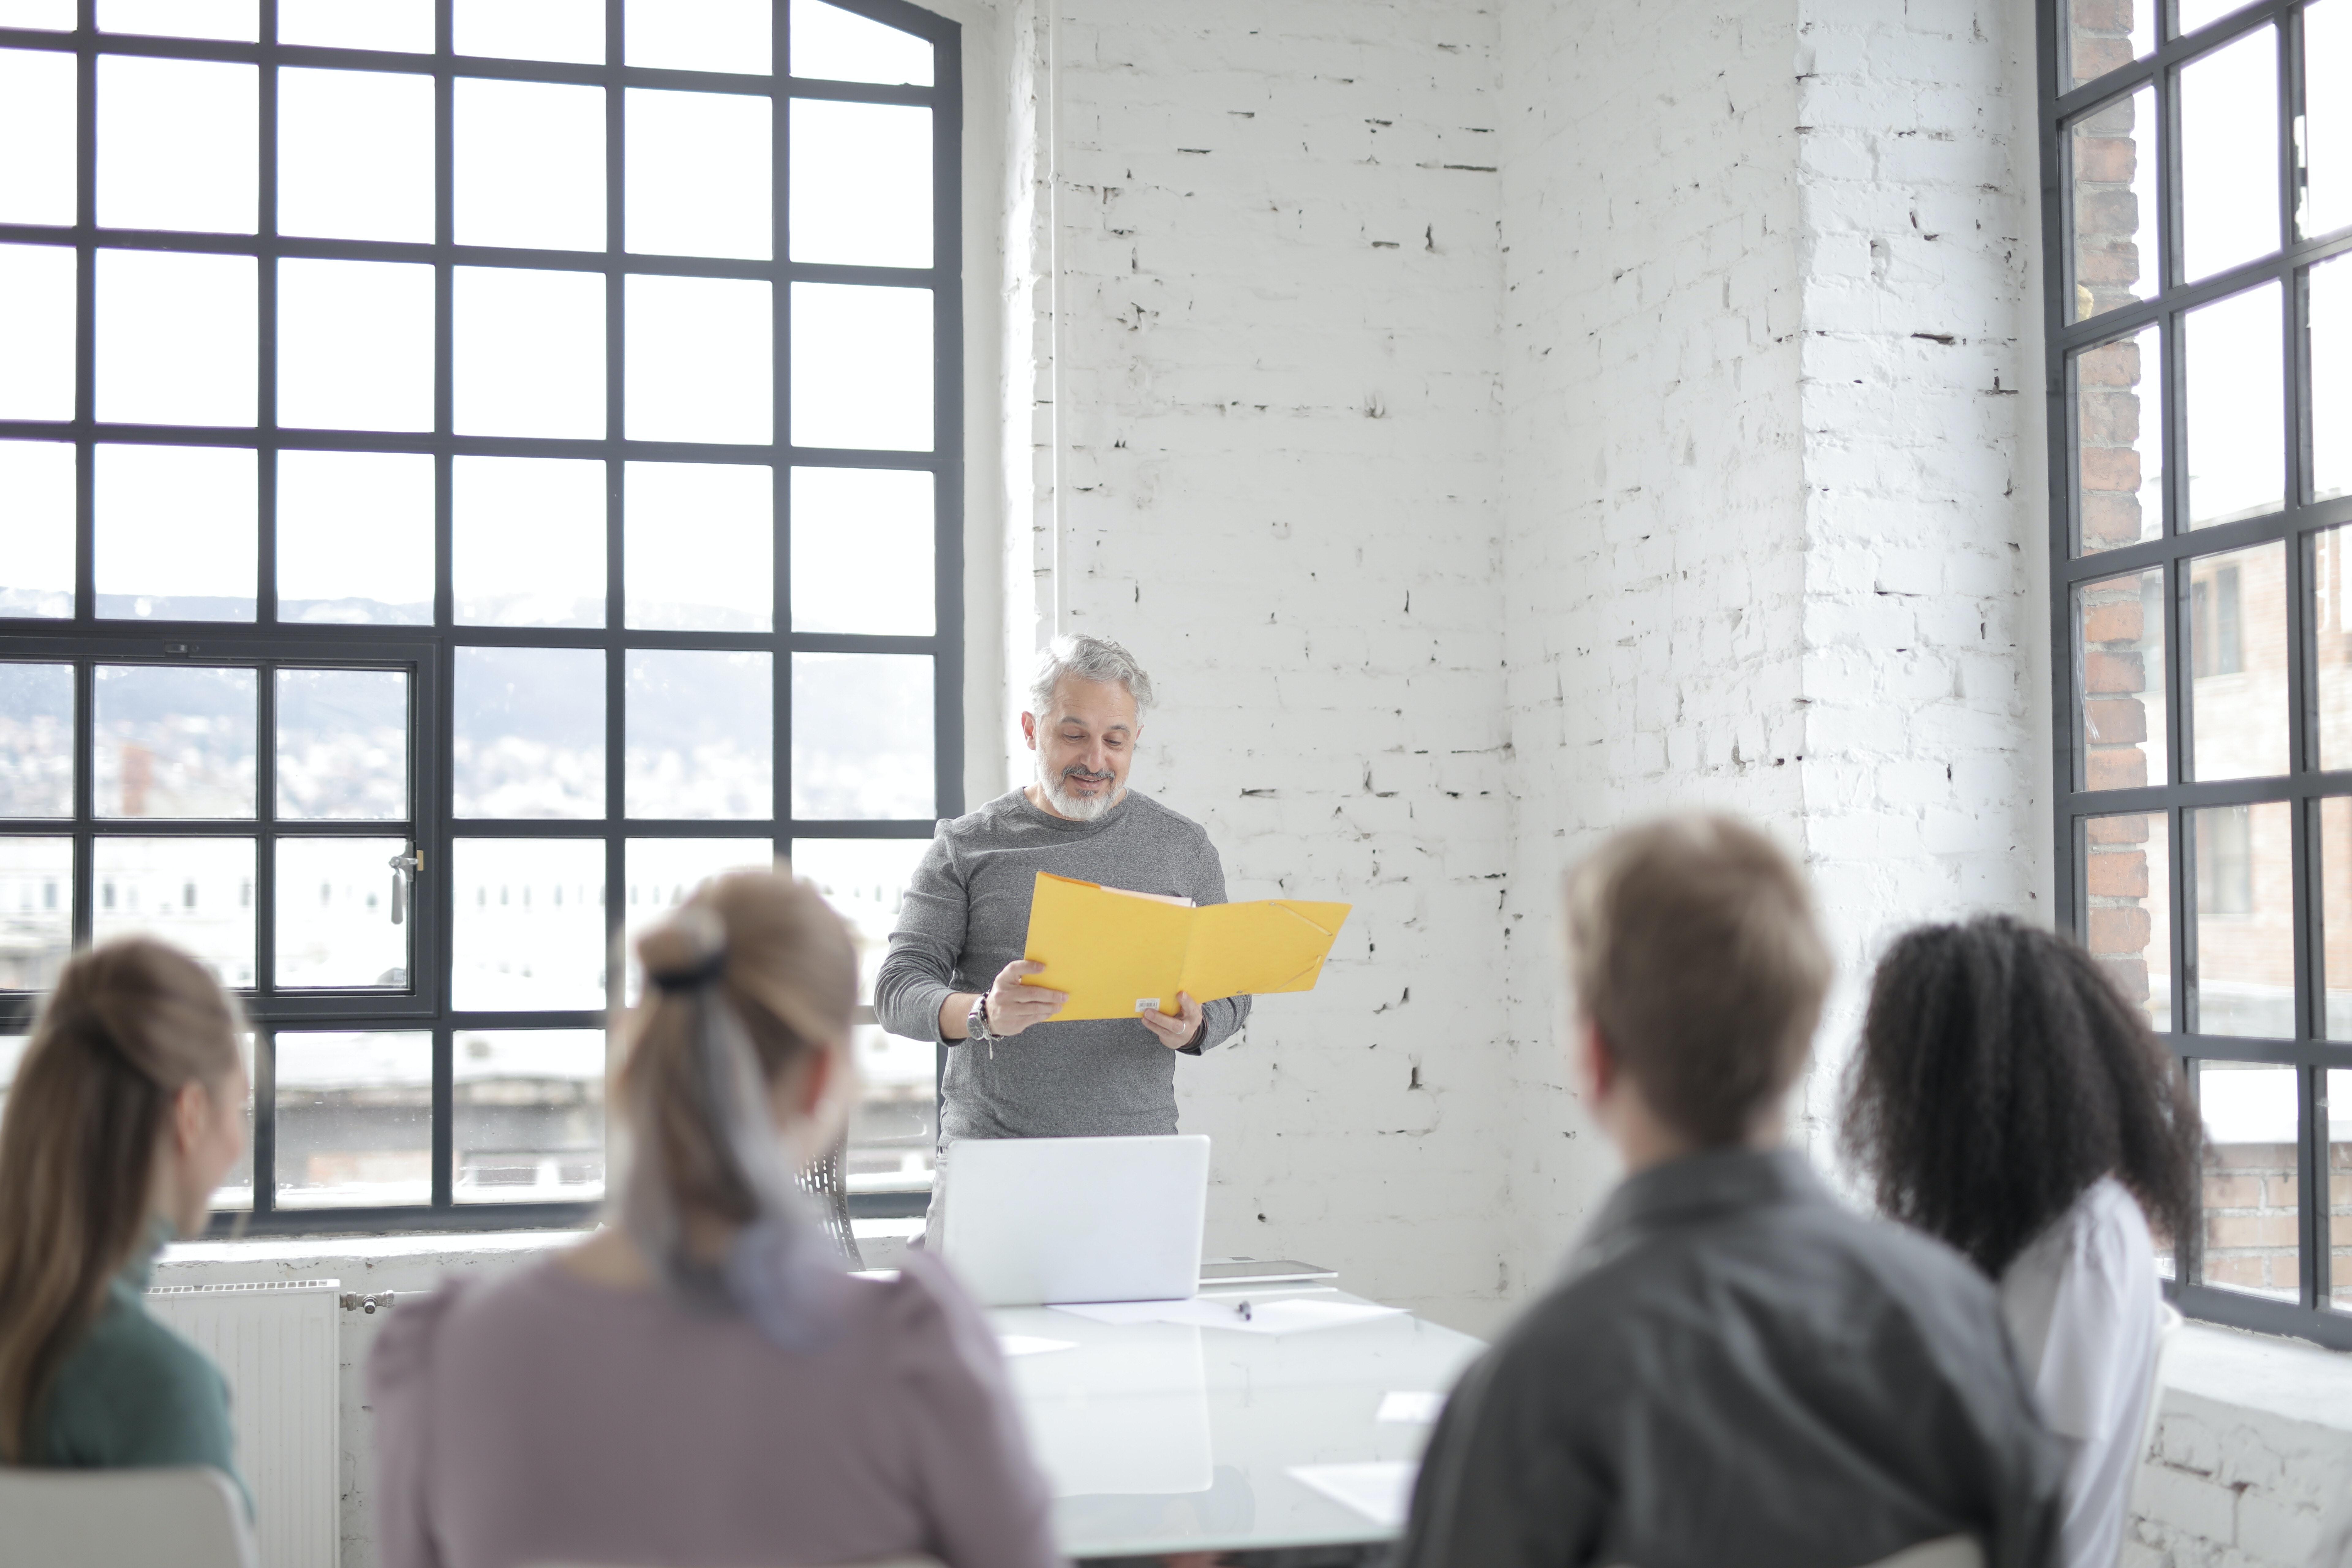 Man giving a talk on International Men's Day